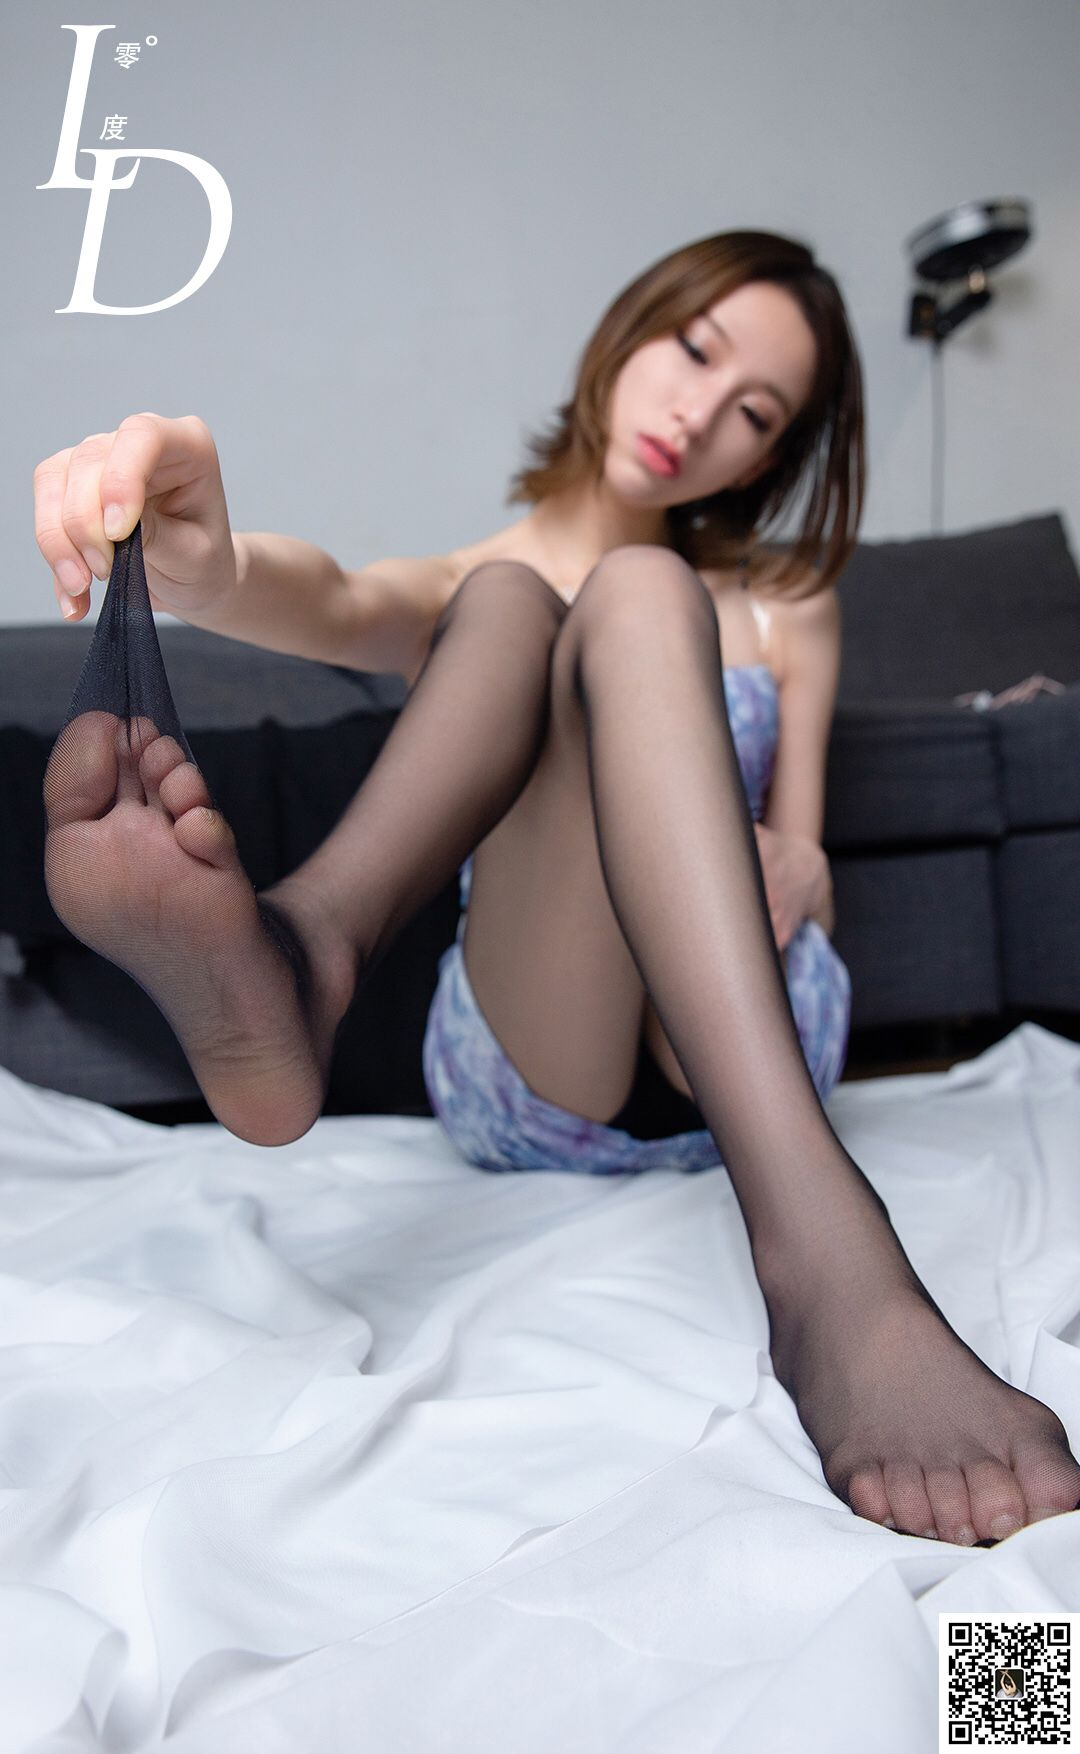 VOL.421 [LD零度]丝袜少妇:芝子高品质写真套图(56P)